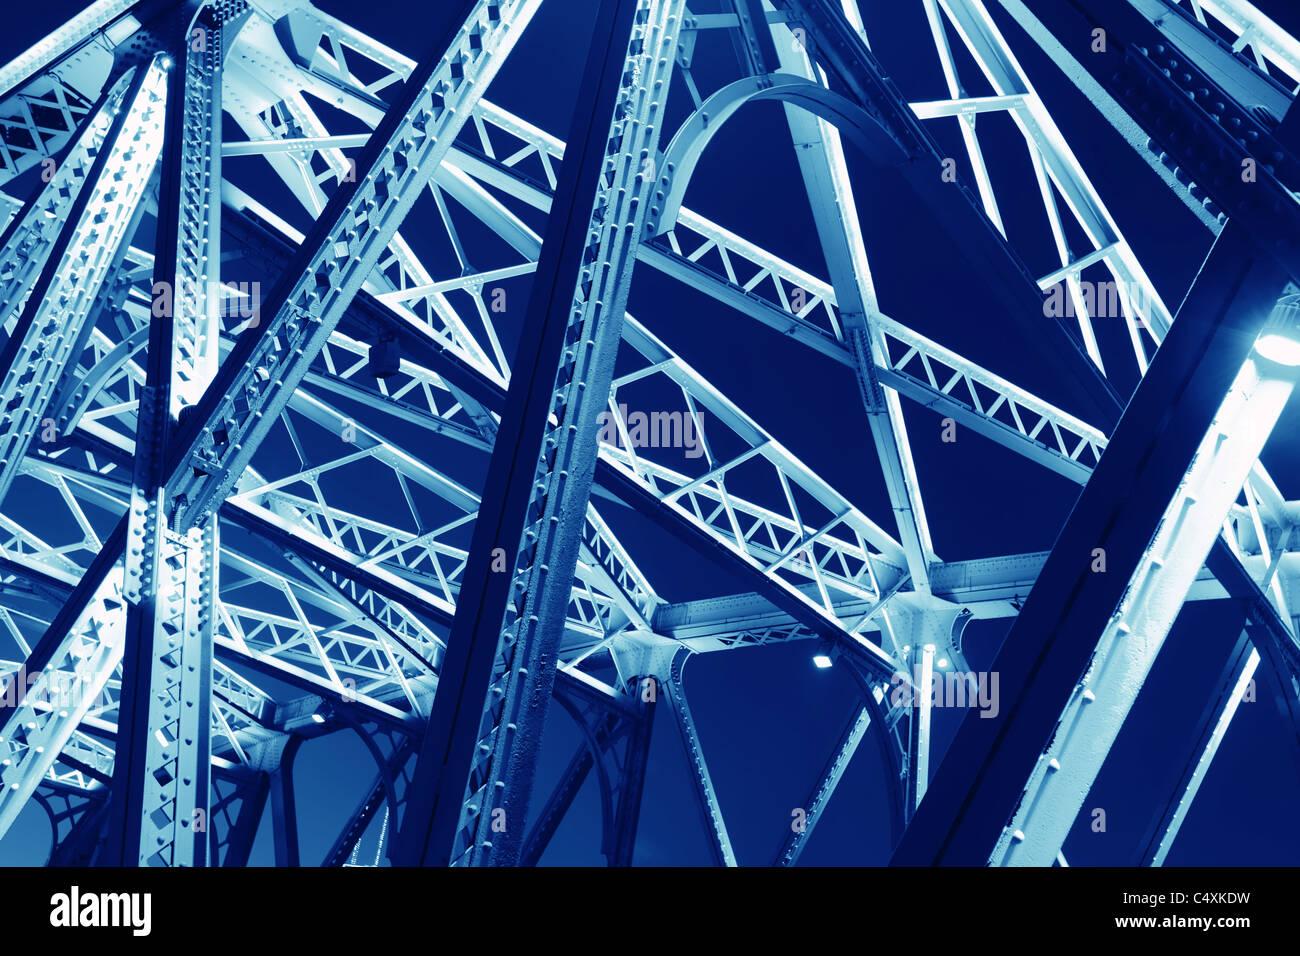 Estructura de acero para utilizar como fondo Imagen De Stock